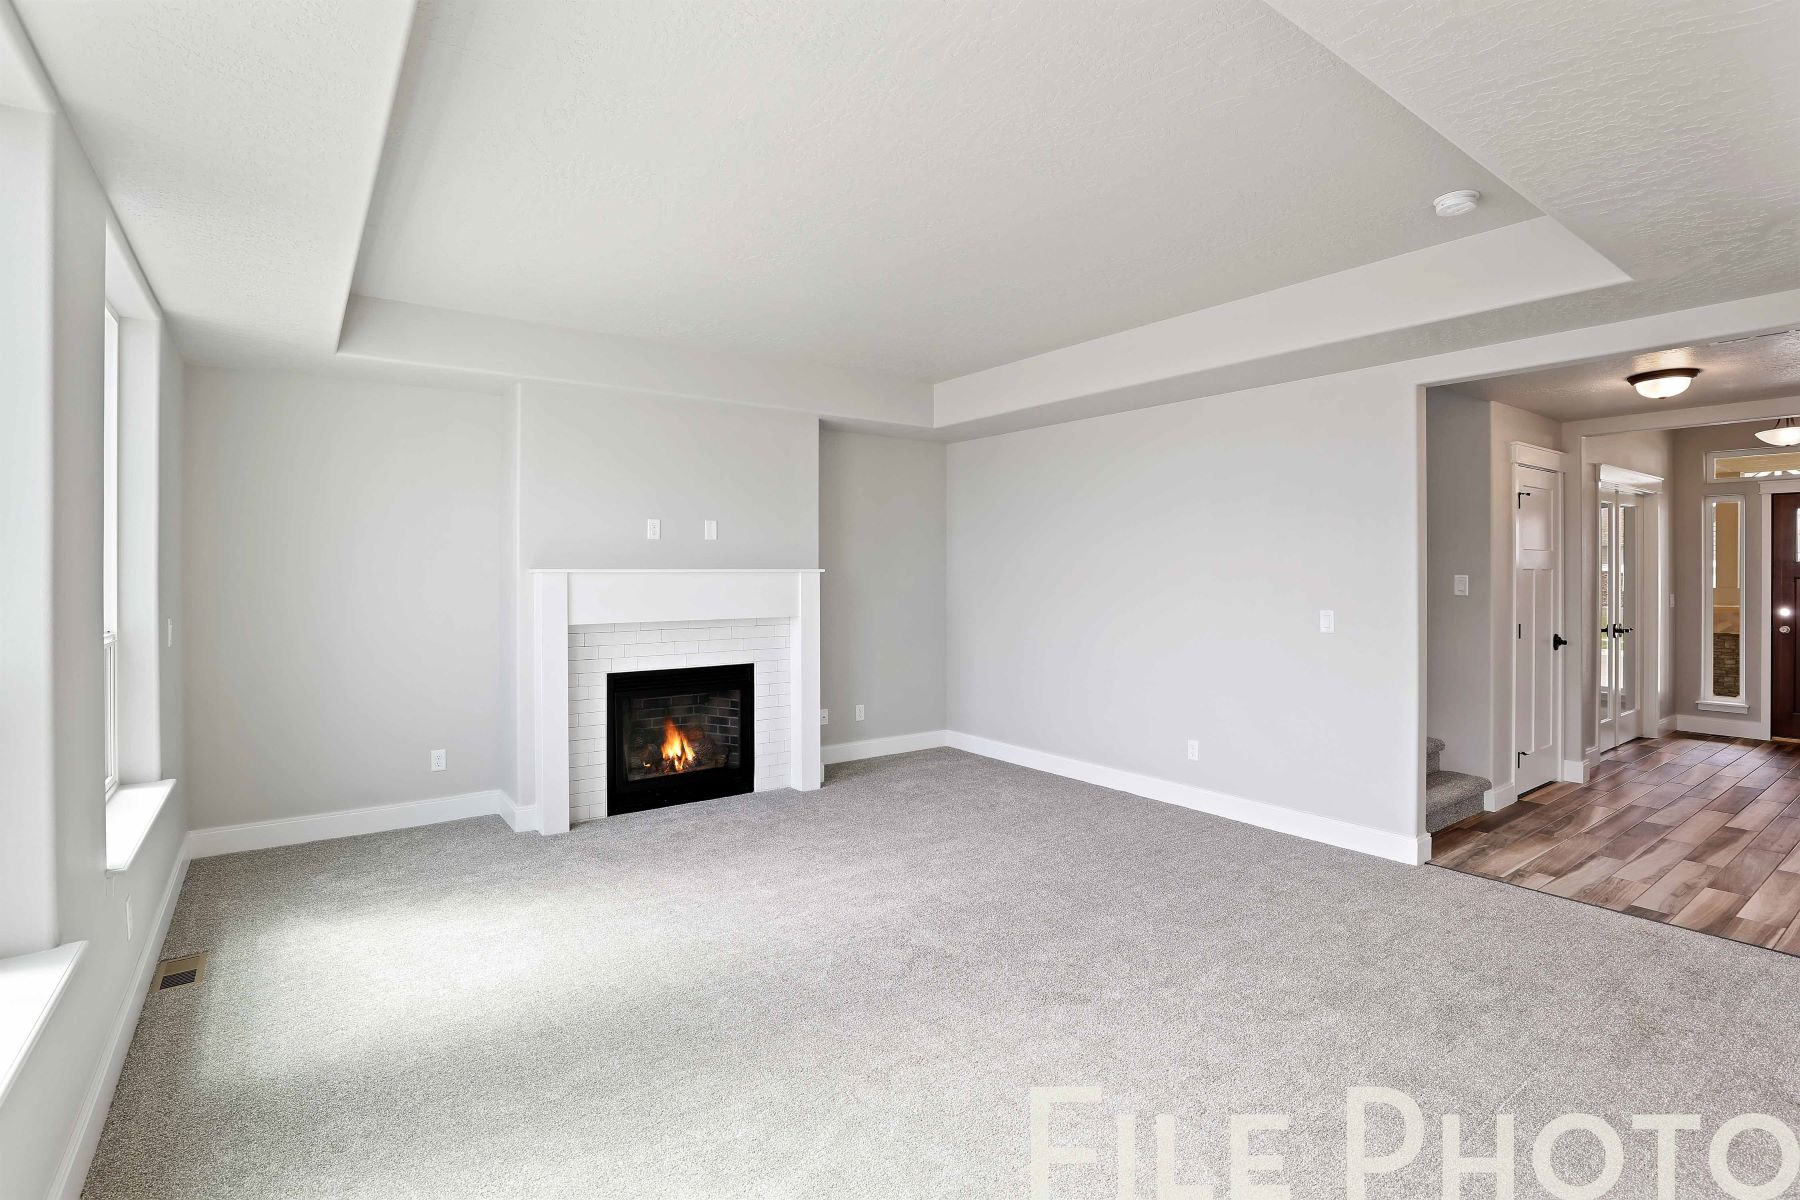 Single Family Homes for Sale at Viking Builders signature series TETON floor plan! 543 Summerview Lane Richland, Washington 99352 United States